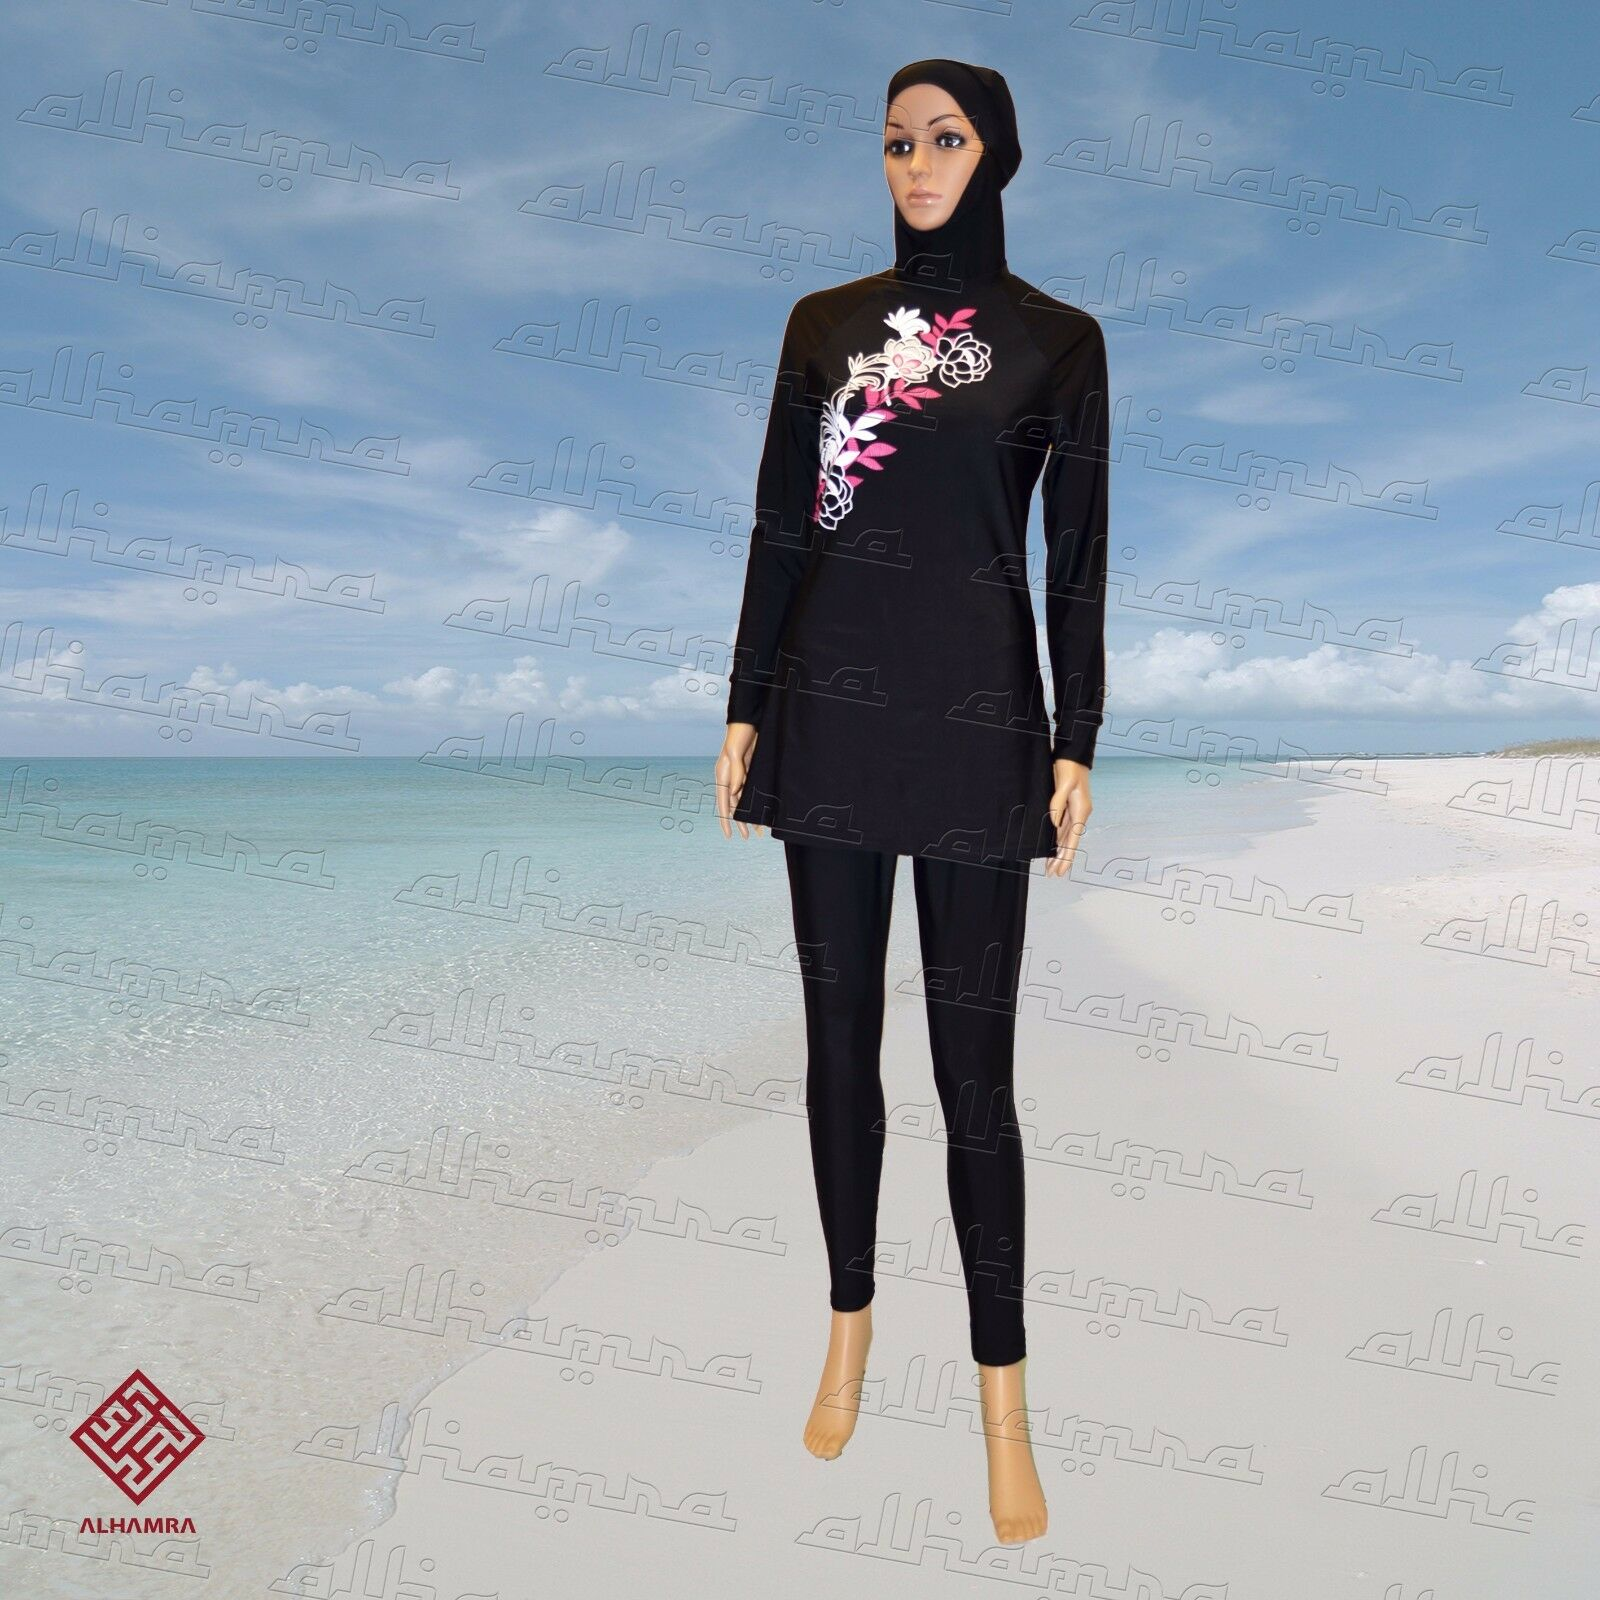 Al-Hamra Aloha NEW Modest Full Cover Muslim Islamic Swimsuit Swimwear burkini